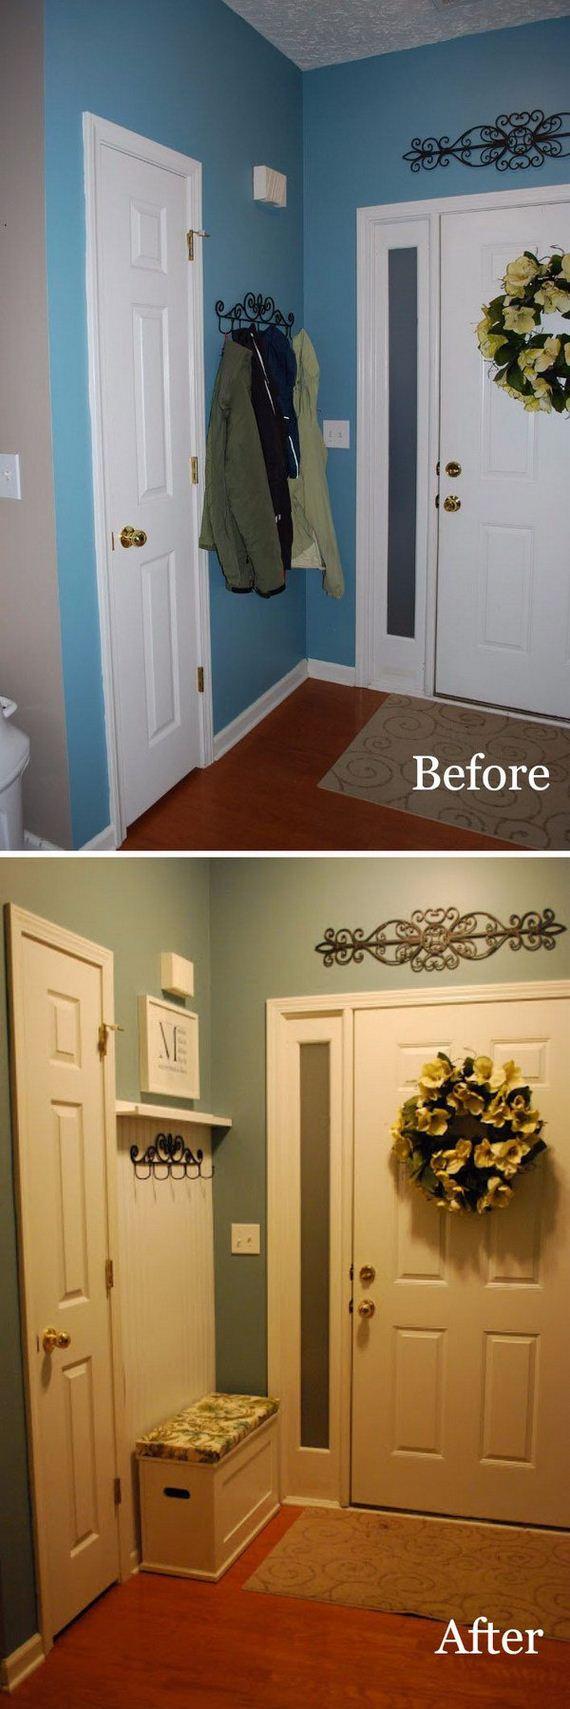 09-amazing-entryway-makeover